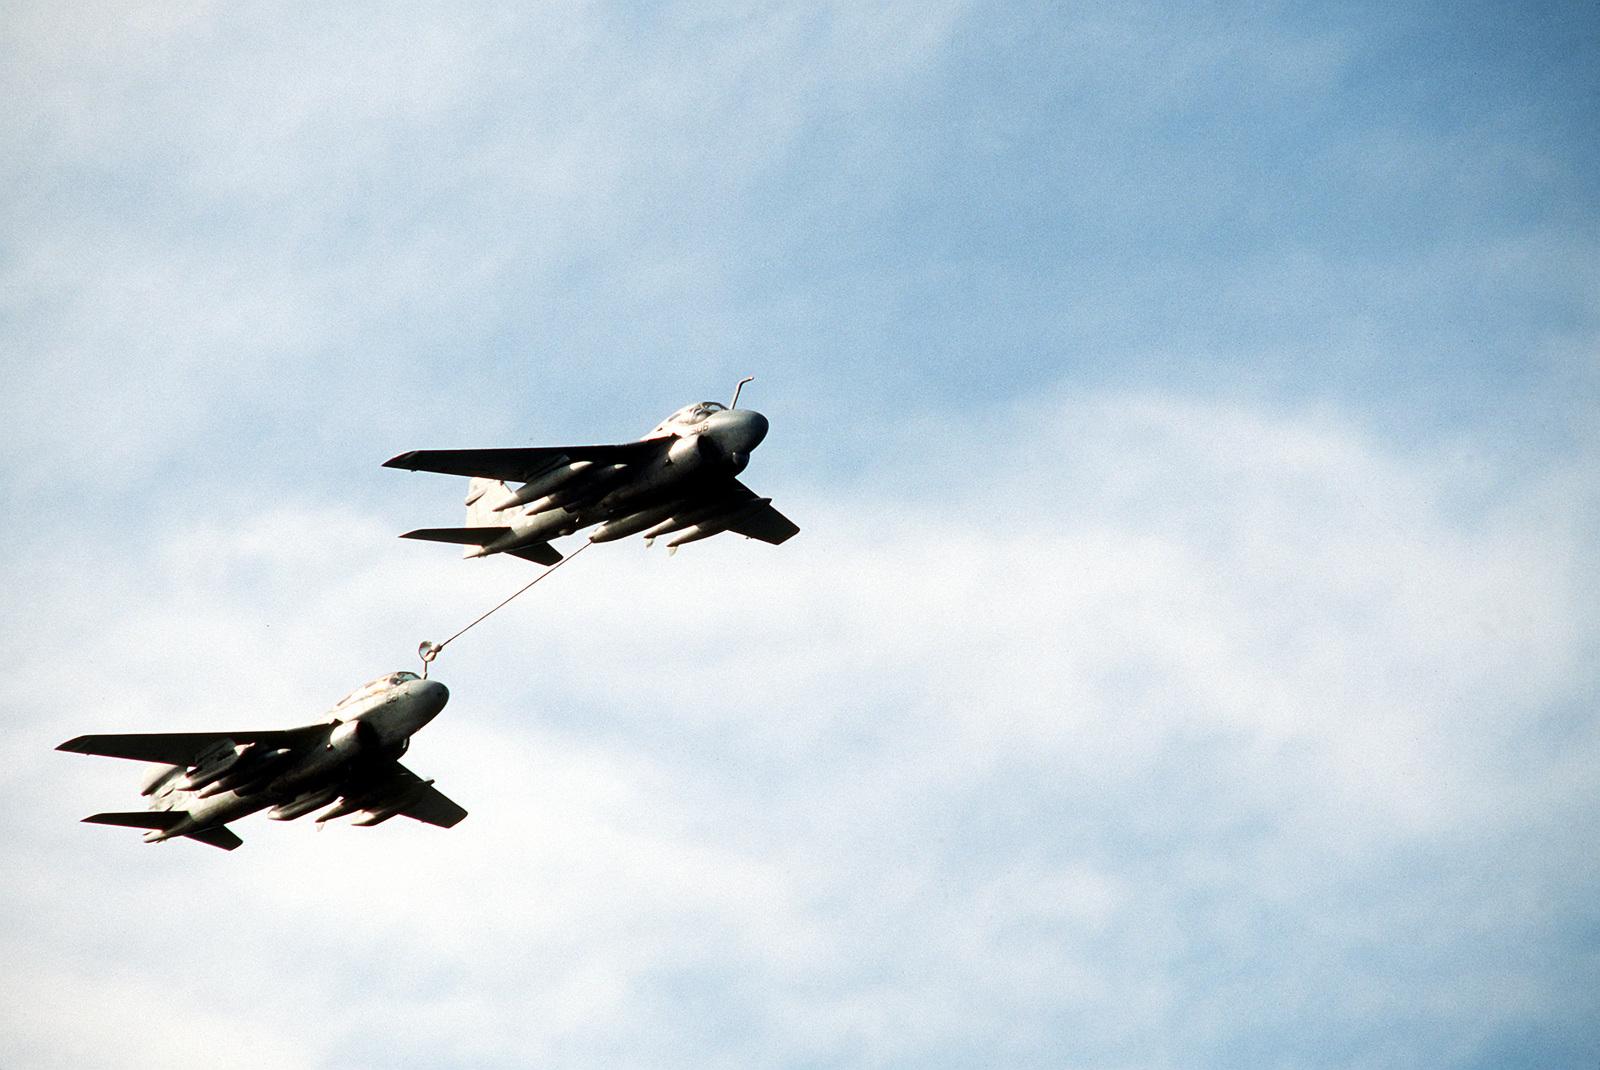 An KA-6E Intruder aircraft of Attack Squadron 95 (VA-95), the Green Lizards, is shown refueling an EA-6B Prowler aircraft of Tactical Warfare Squadron 135 (VAQ-135), the Black Ravens, during a fire power demonstration near the nuclear-powered aircraft carrier USS ABRAHAM LINCOLN (CVN-72) (not shown)